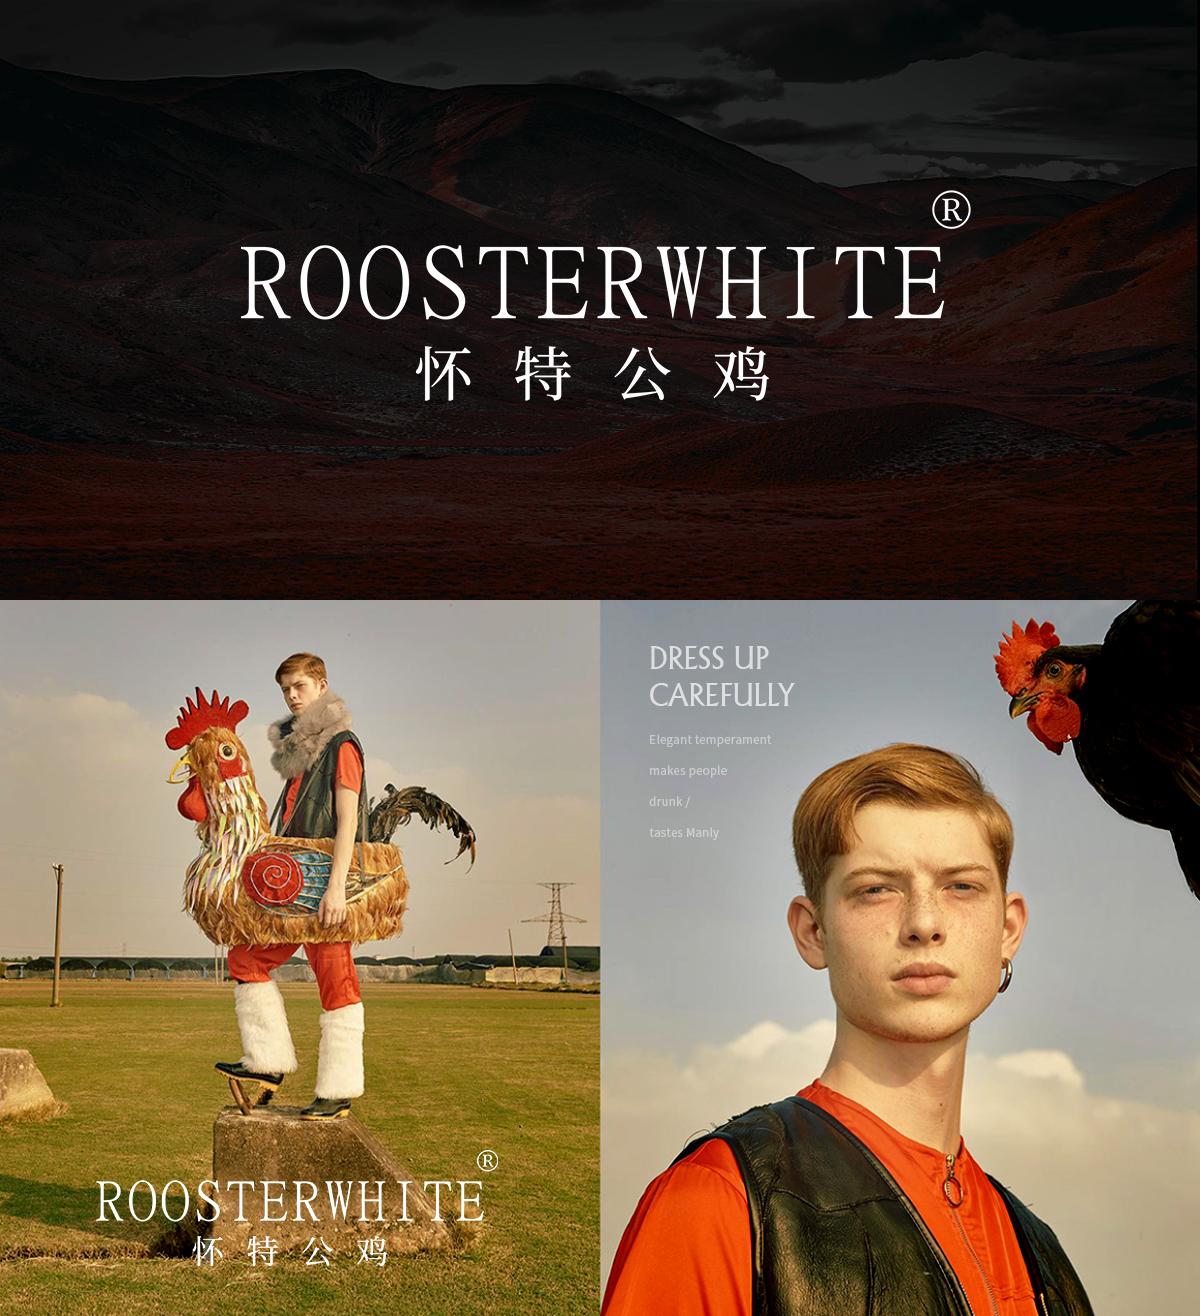 怀特公鸡 ROOSTERWHITE